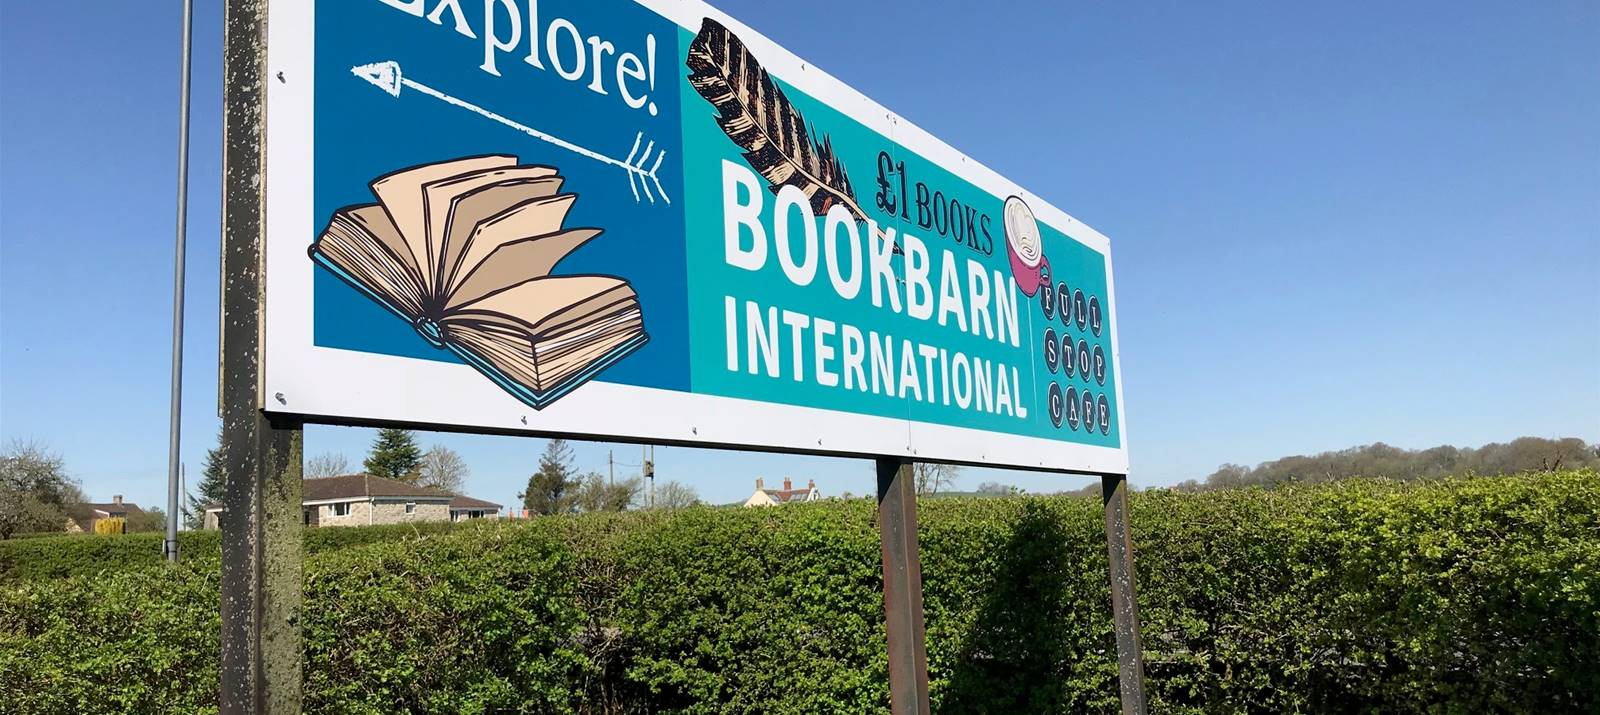 Bookbarn International Roadside Outdoor sign